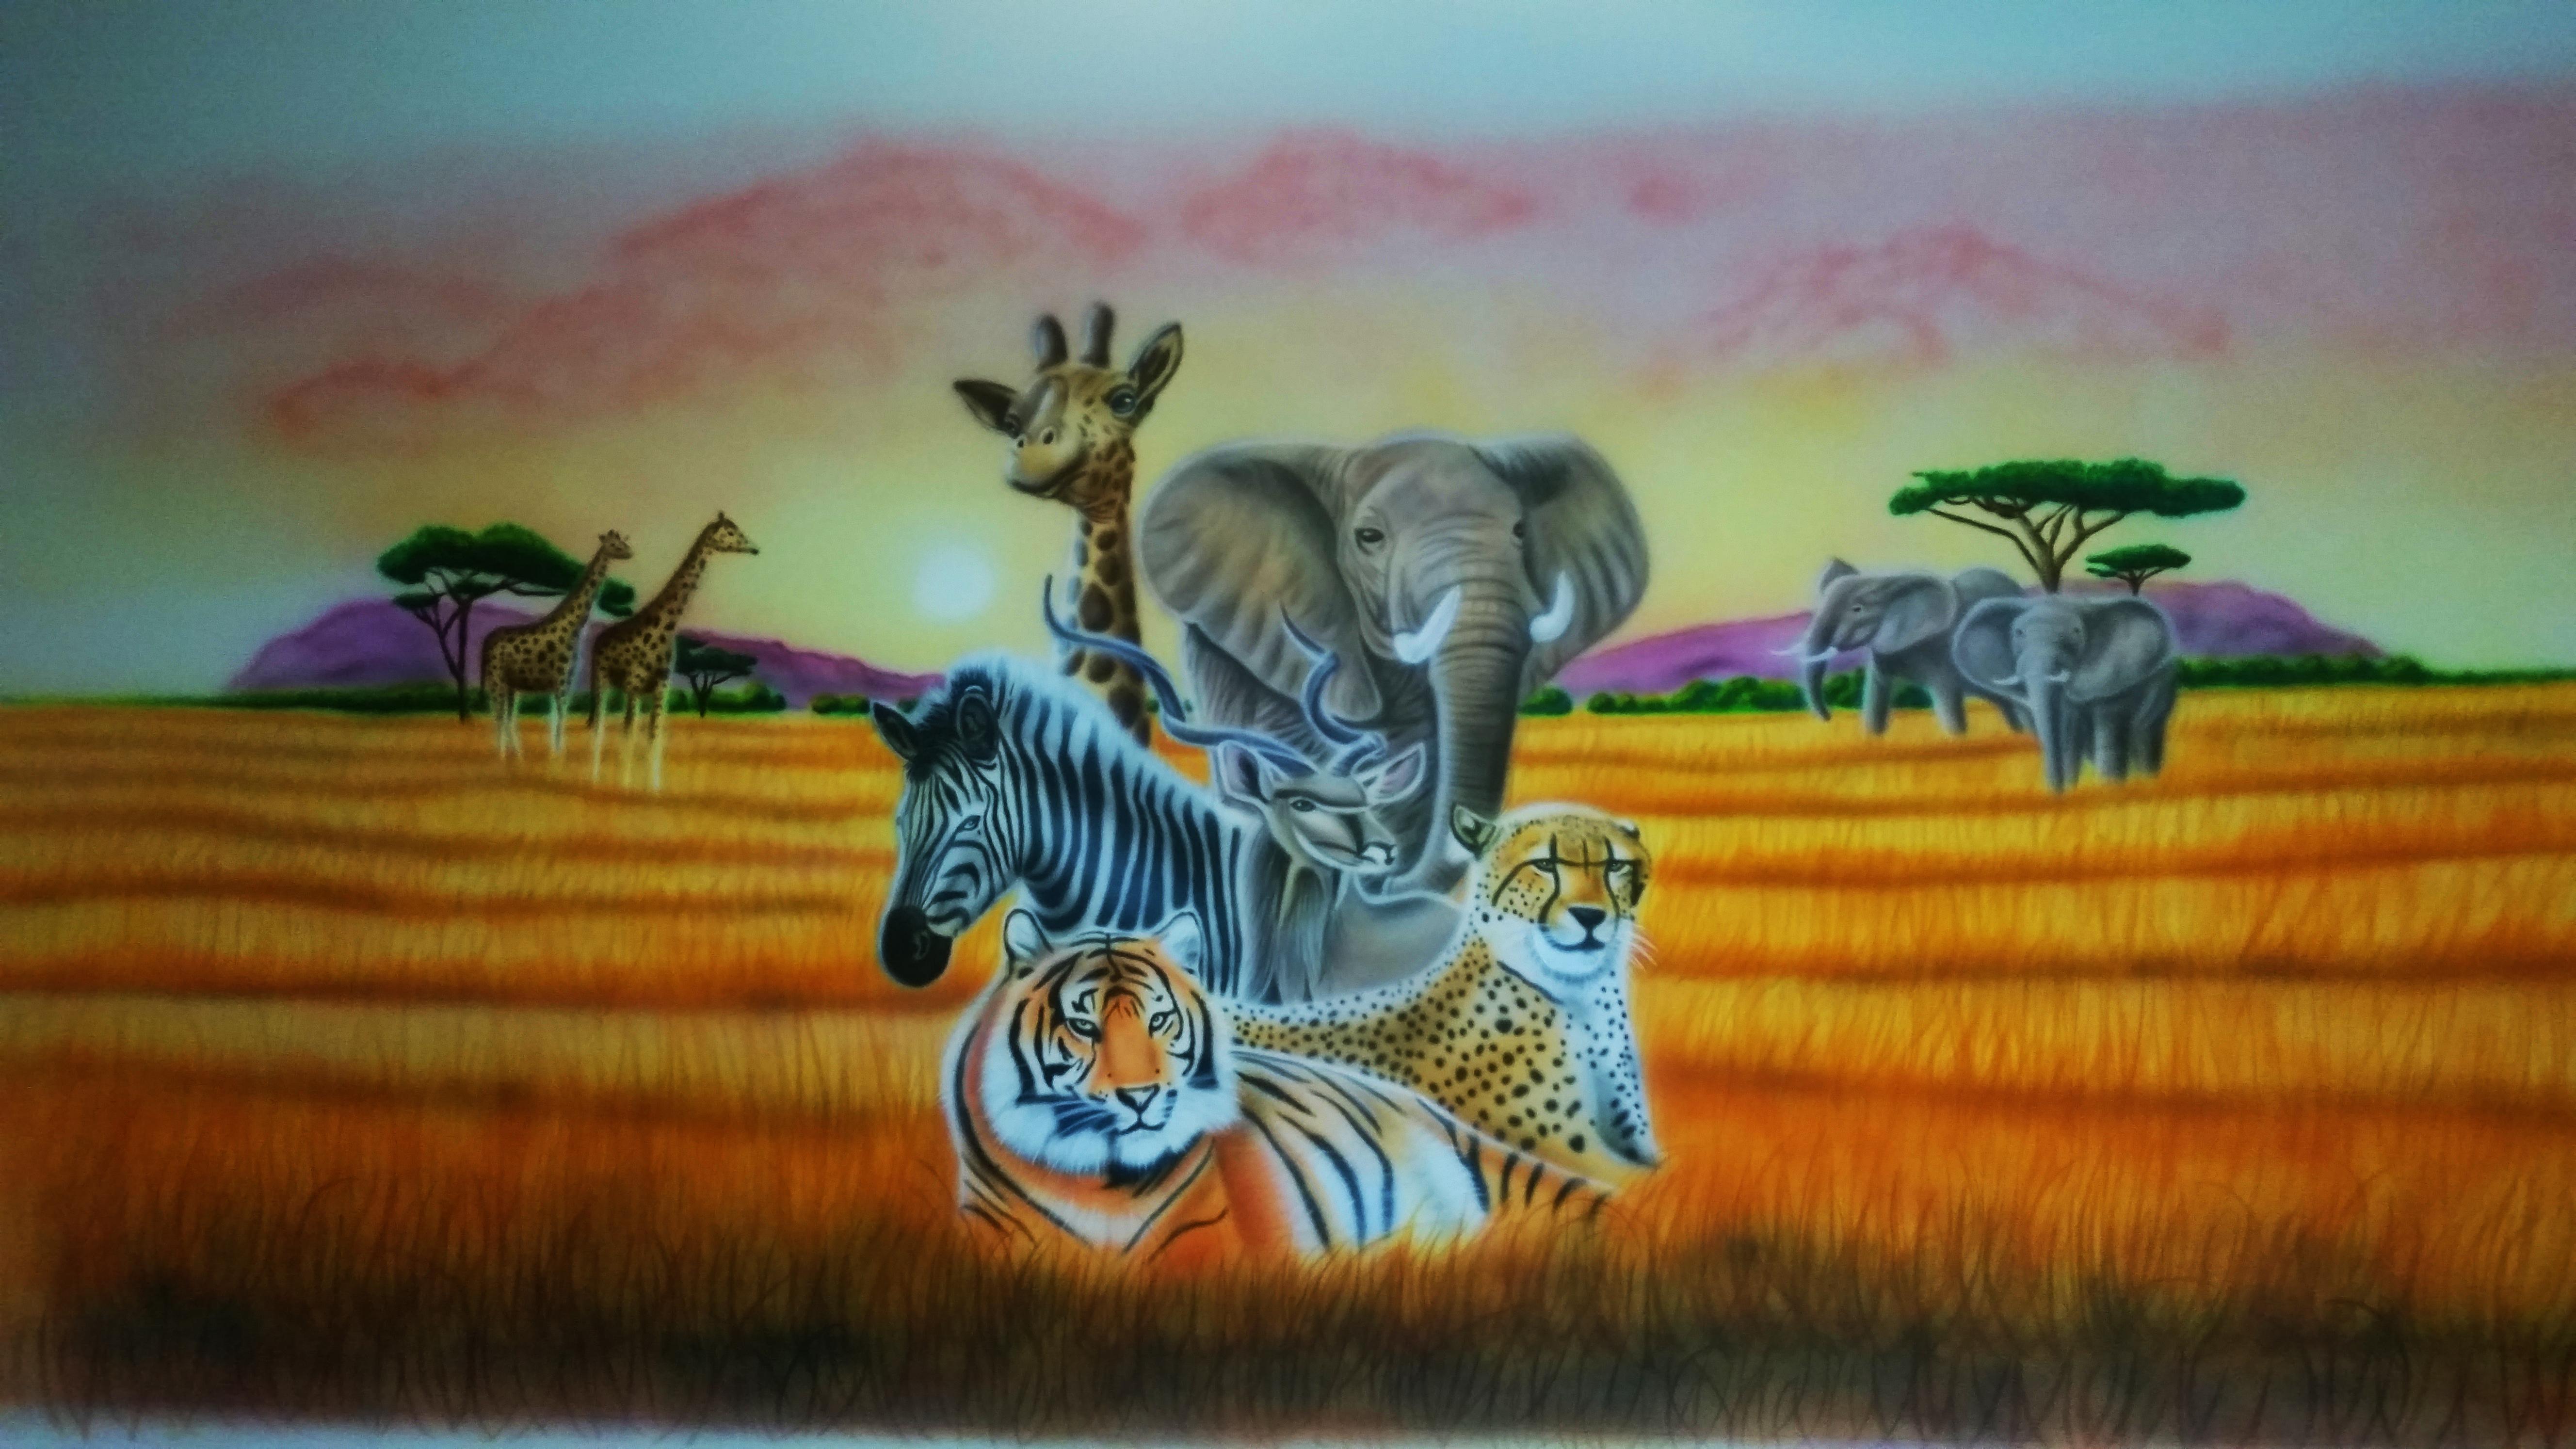 Savannah muurschildering. Olifant, tijger, zebra, cheeta, luipaard, giraffe